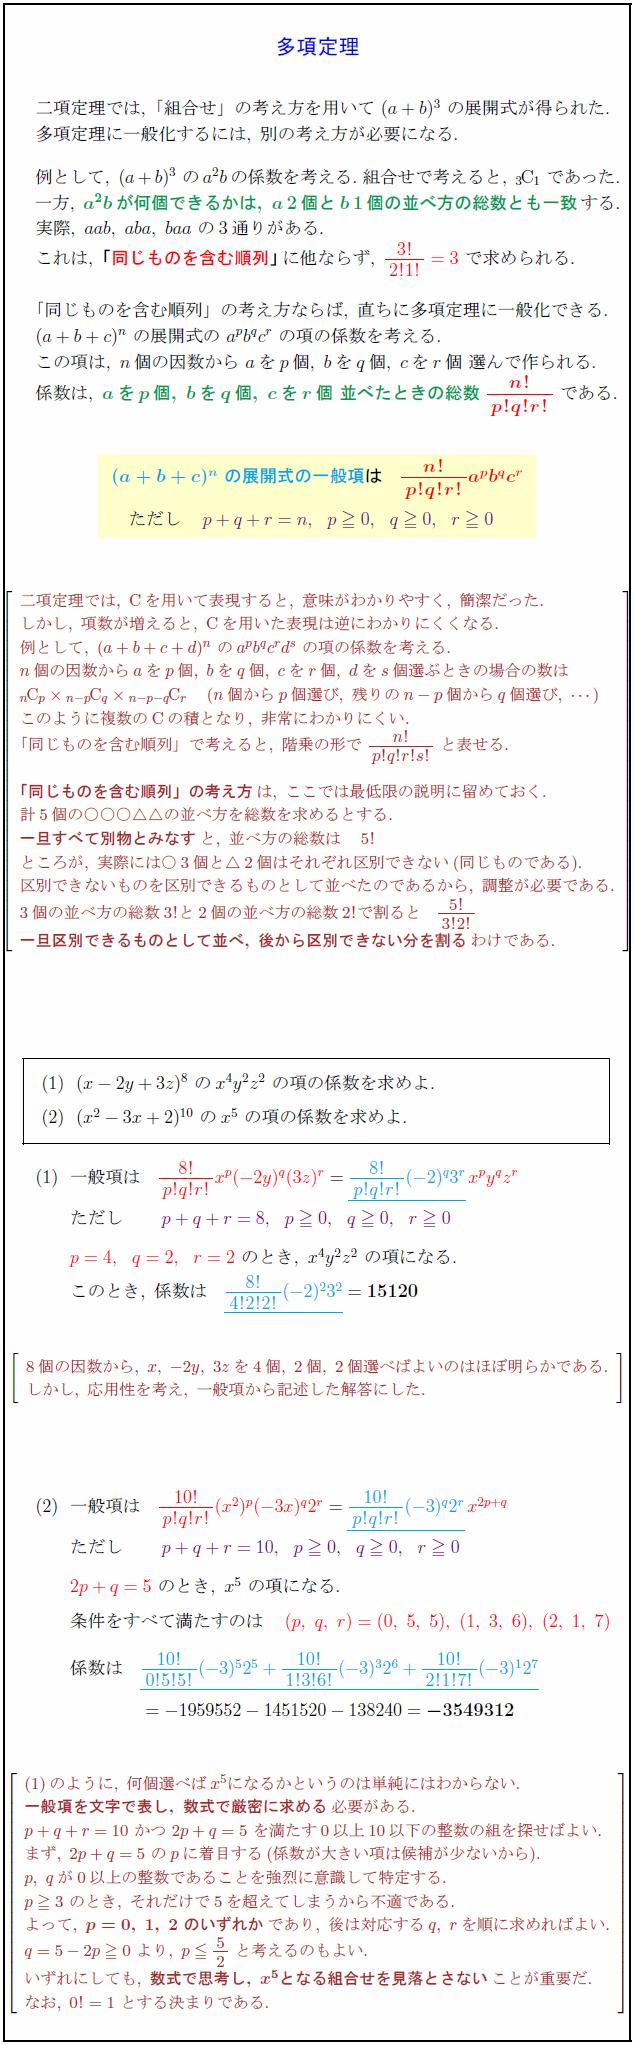 polynominal-theorem